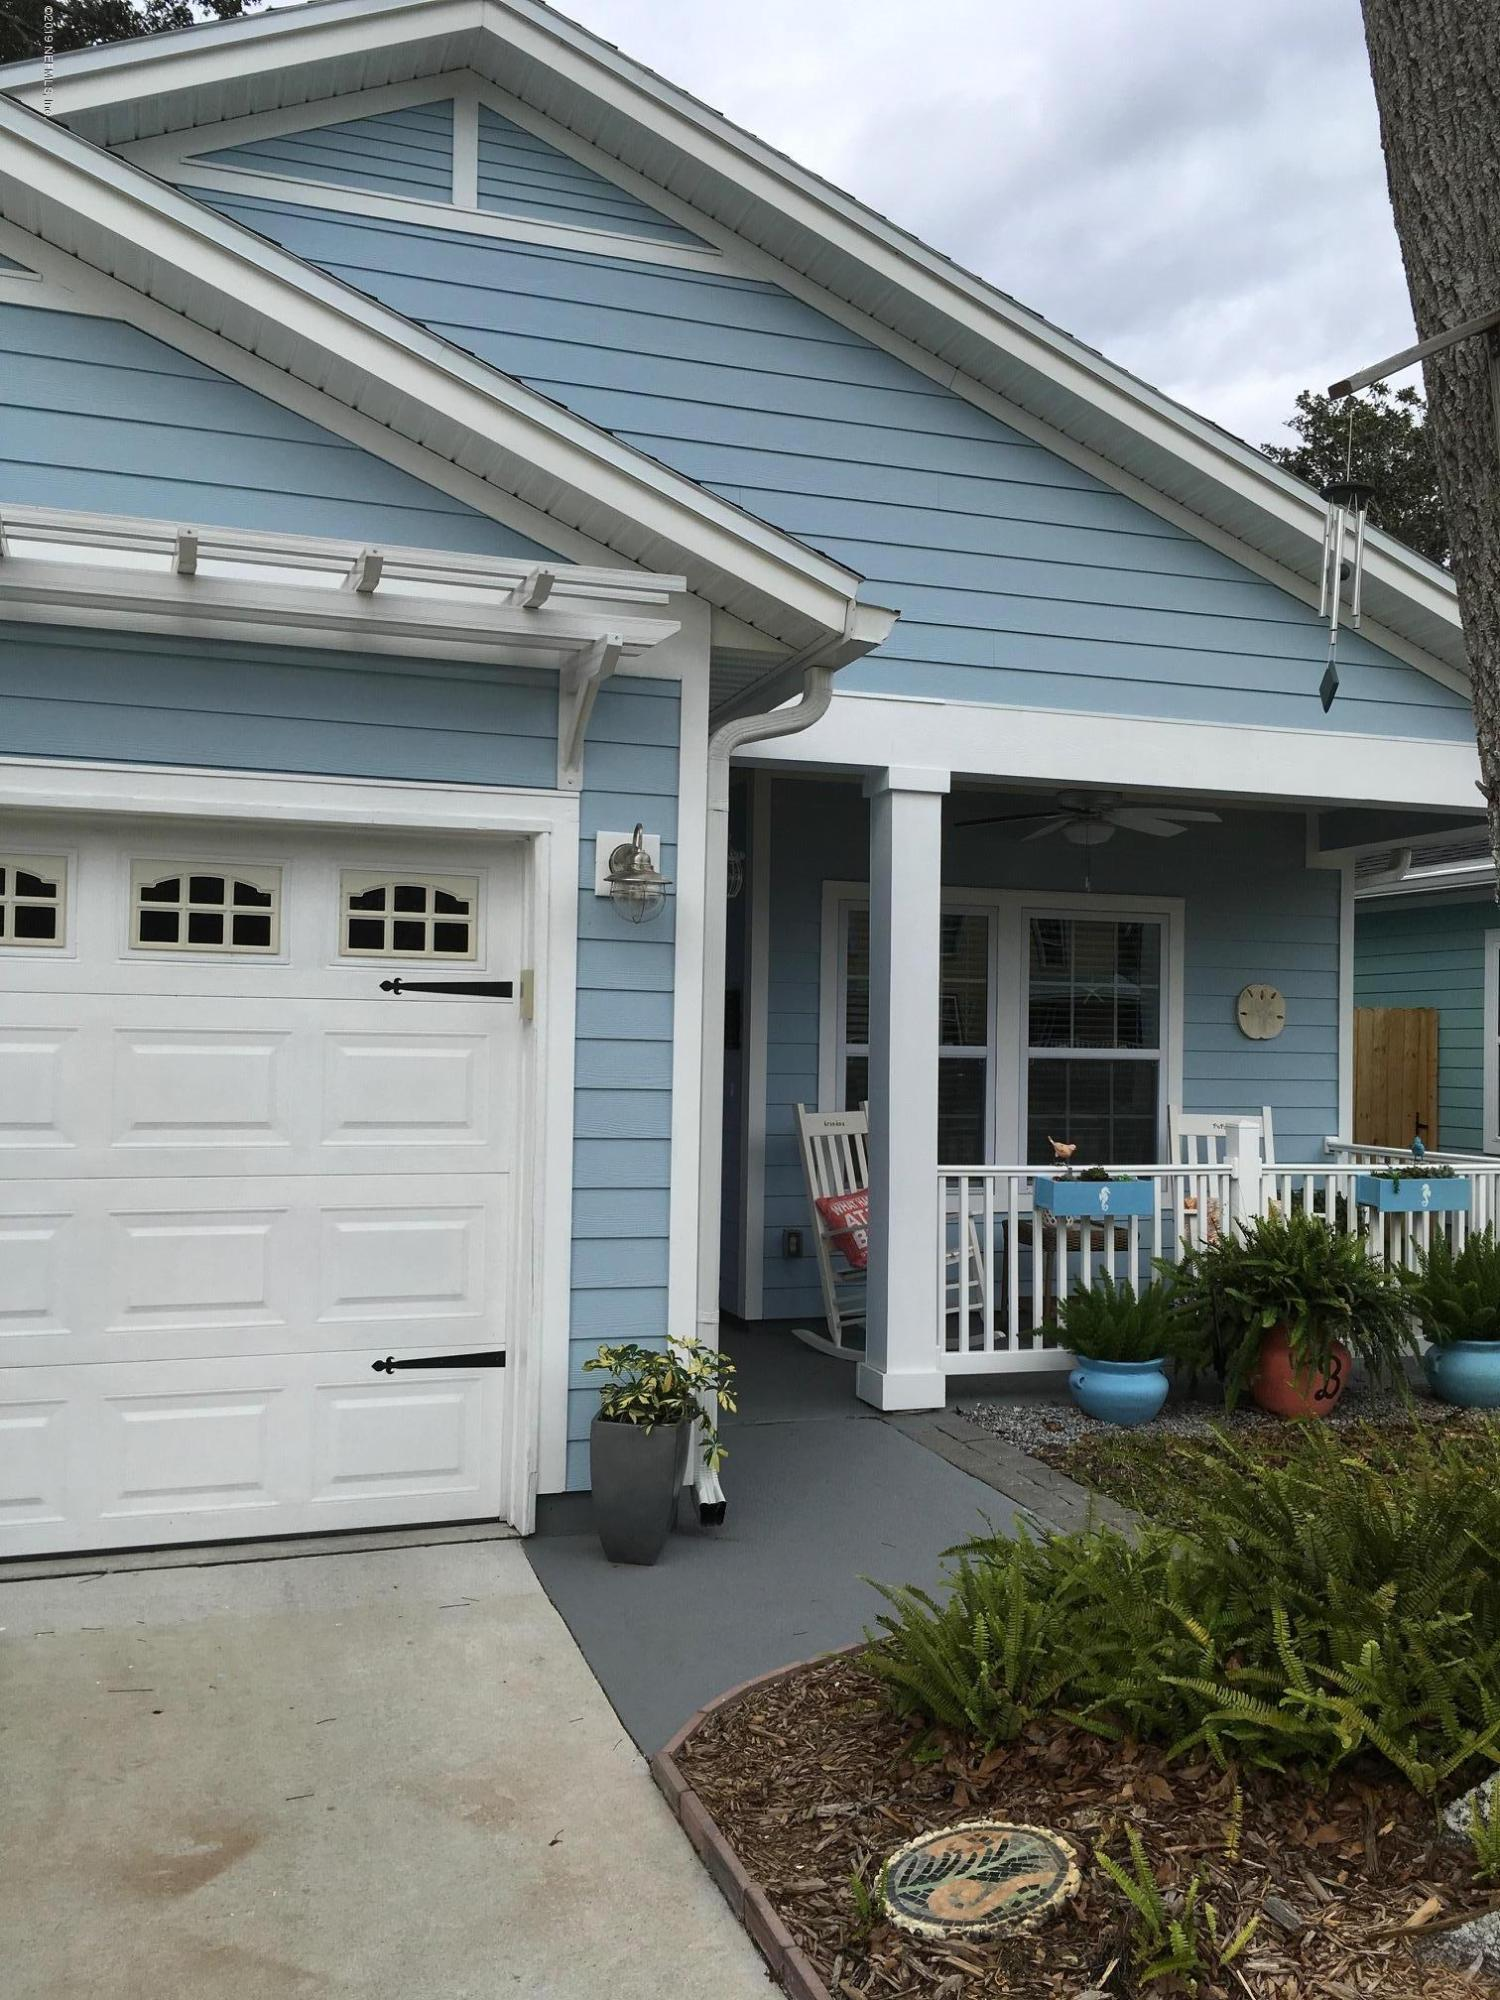 1202 JASMINE, ATLANTIC BEACH, FLORIDA 32233, 3 Bedrooms Bedrooms, ,2 BathroomsBathrooms,Residential - single family,For sale,JASMINE,978749